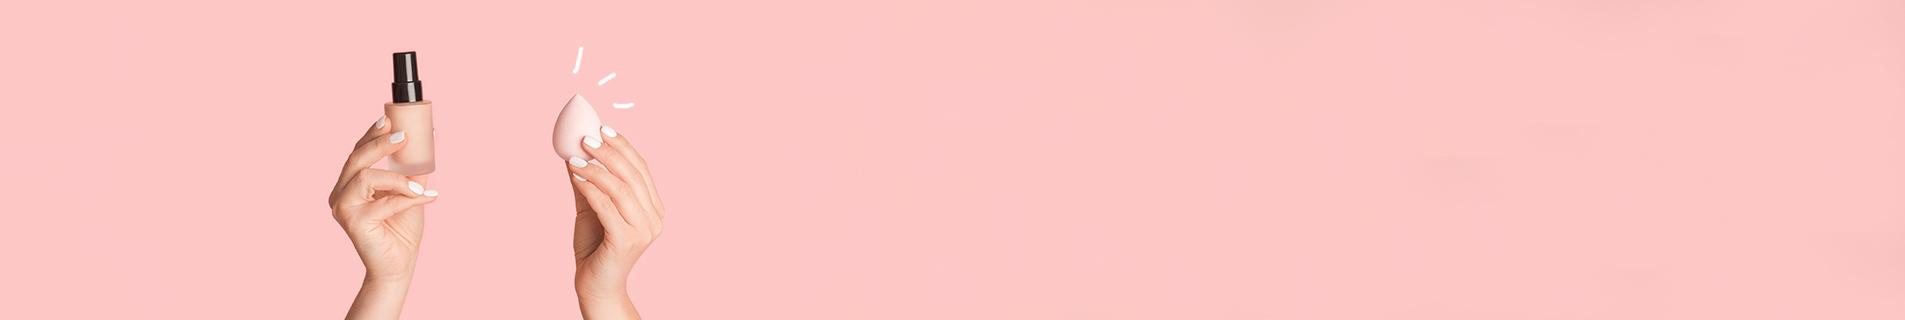 Gloss pas cher   Maquillage lèvres   SAGA Cosmetics